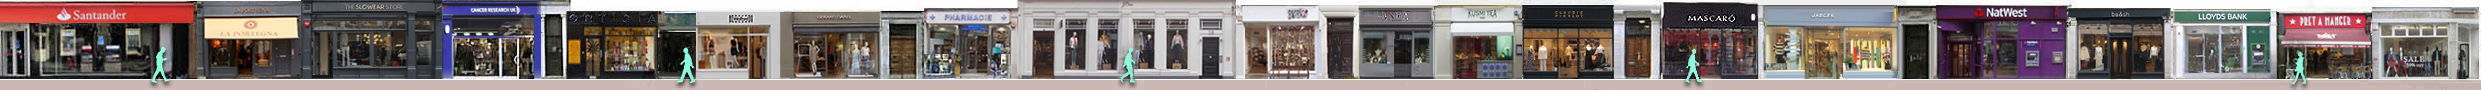 marylebone-london High Street shops